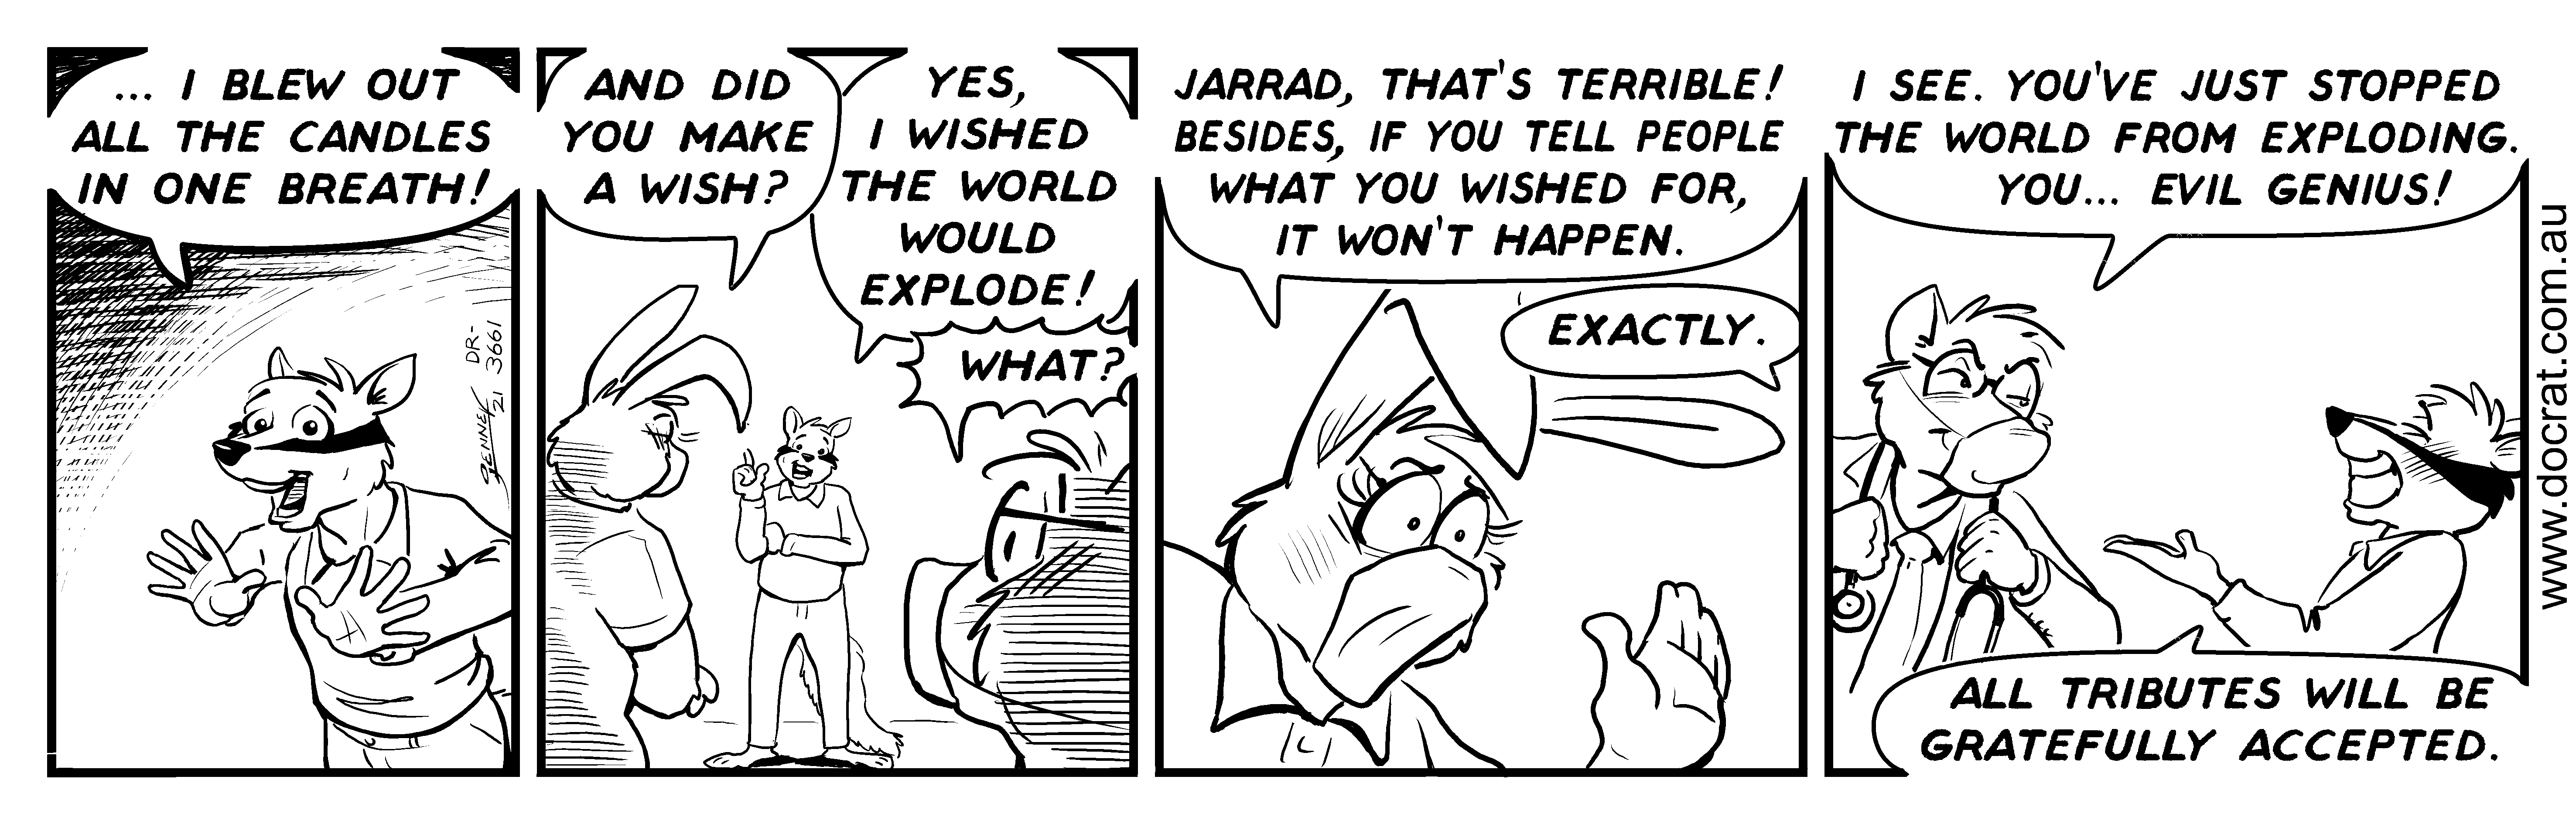 20200125